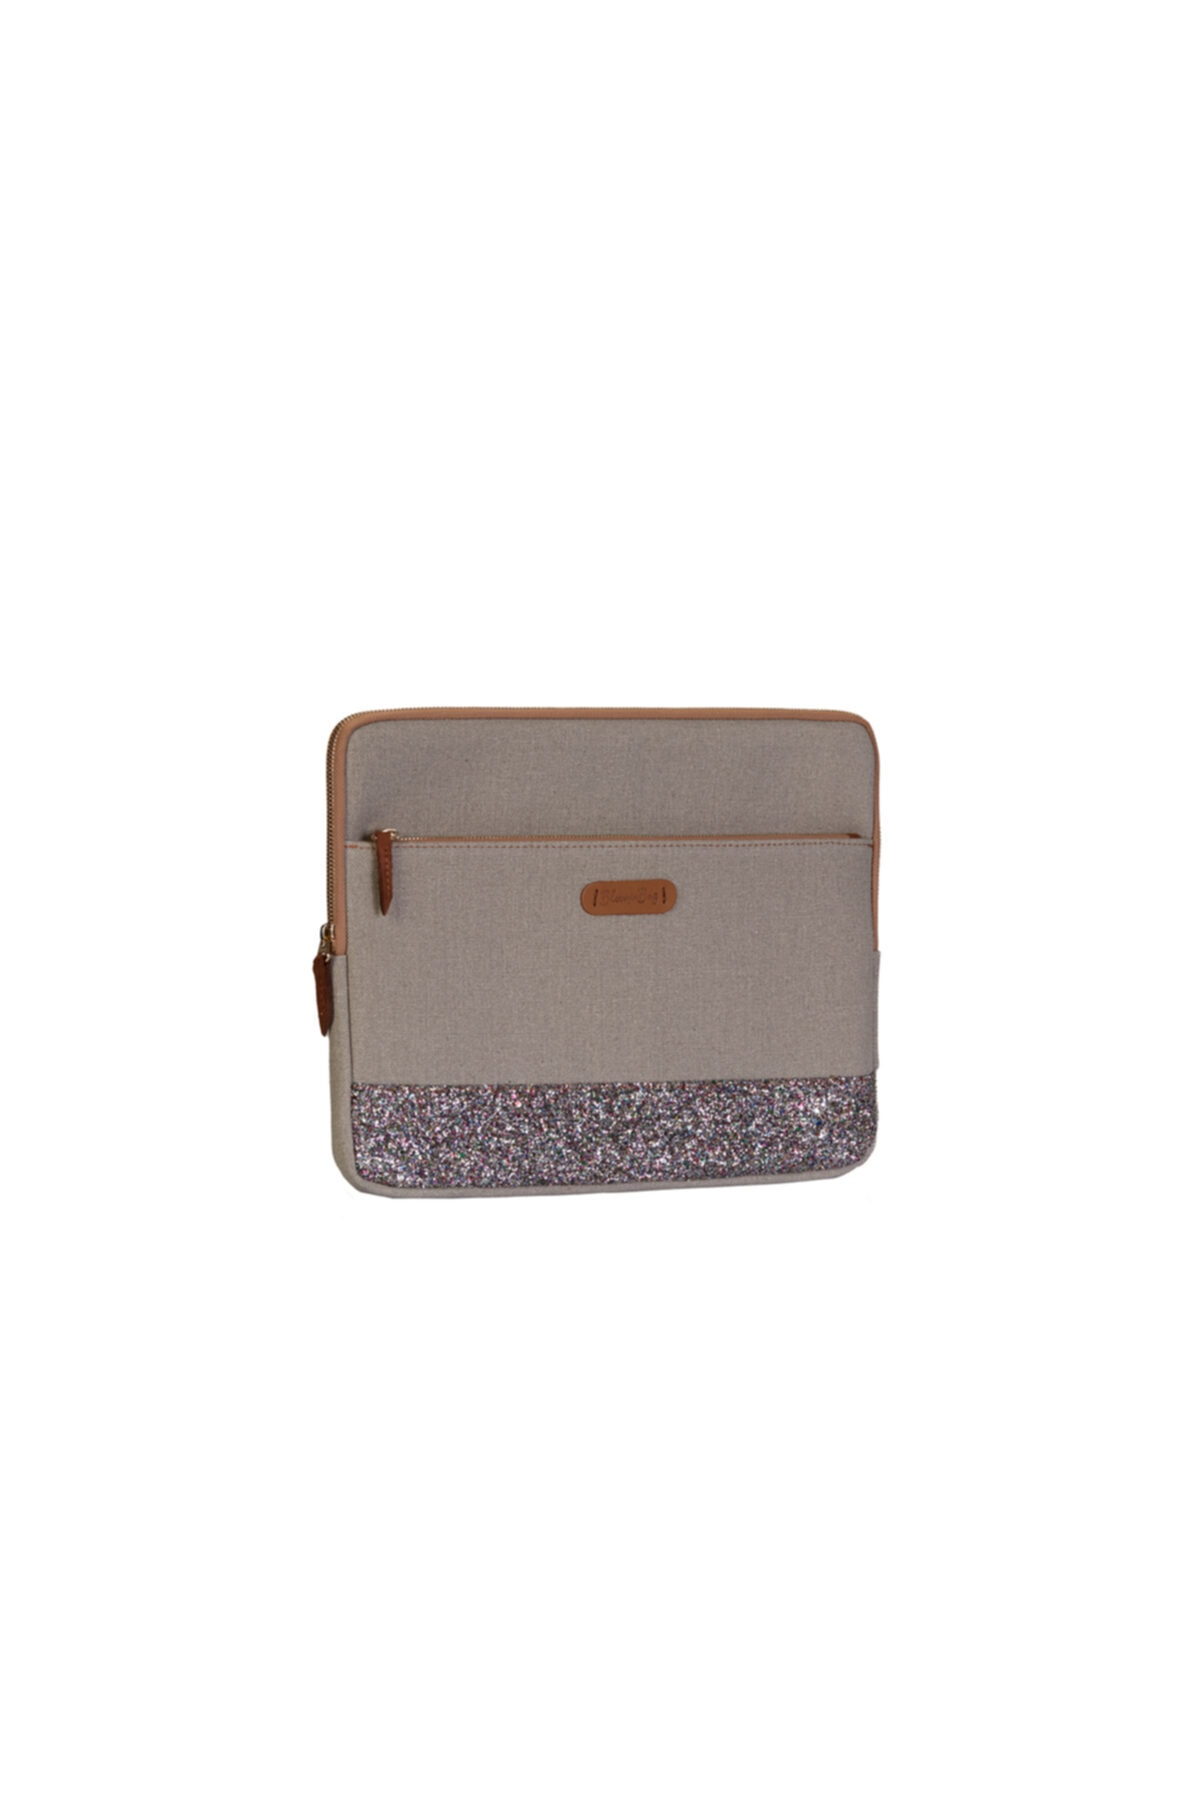 BloominBag Greenish Glitter 15 - 16 Inch Macbook - Laptop Kılıfı 2